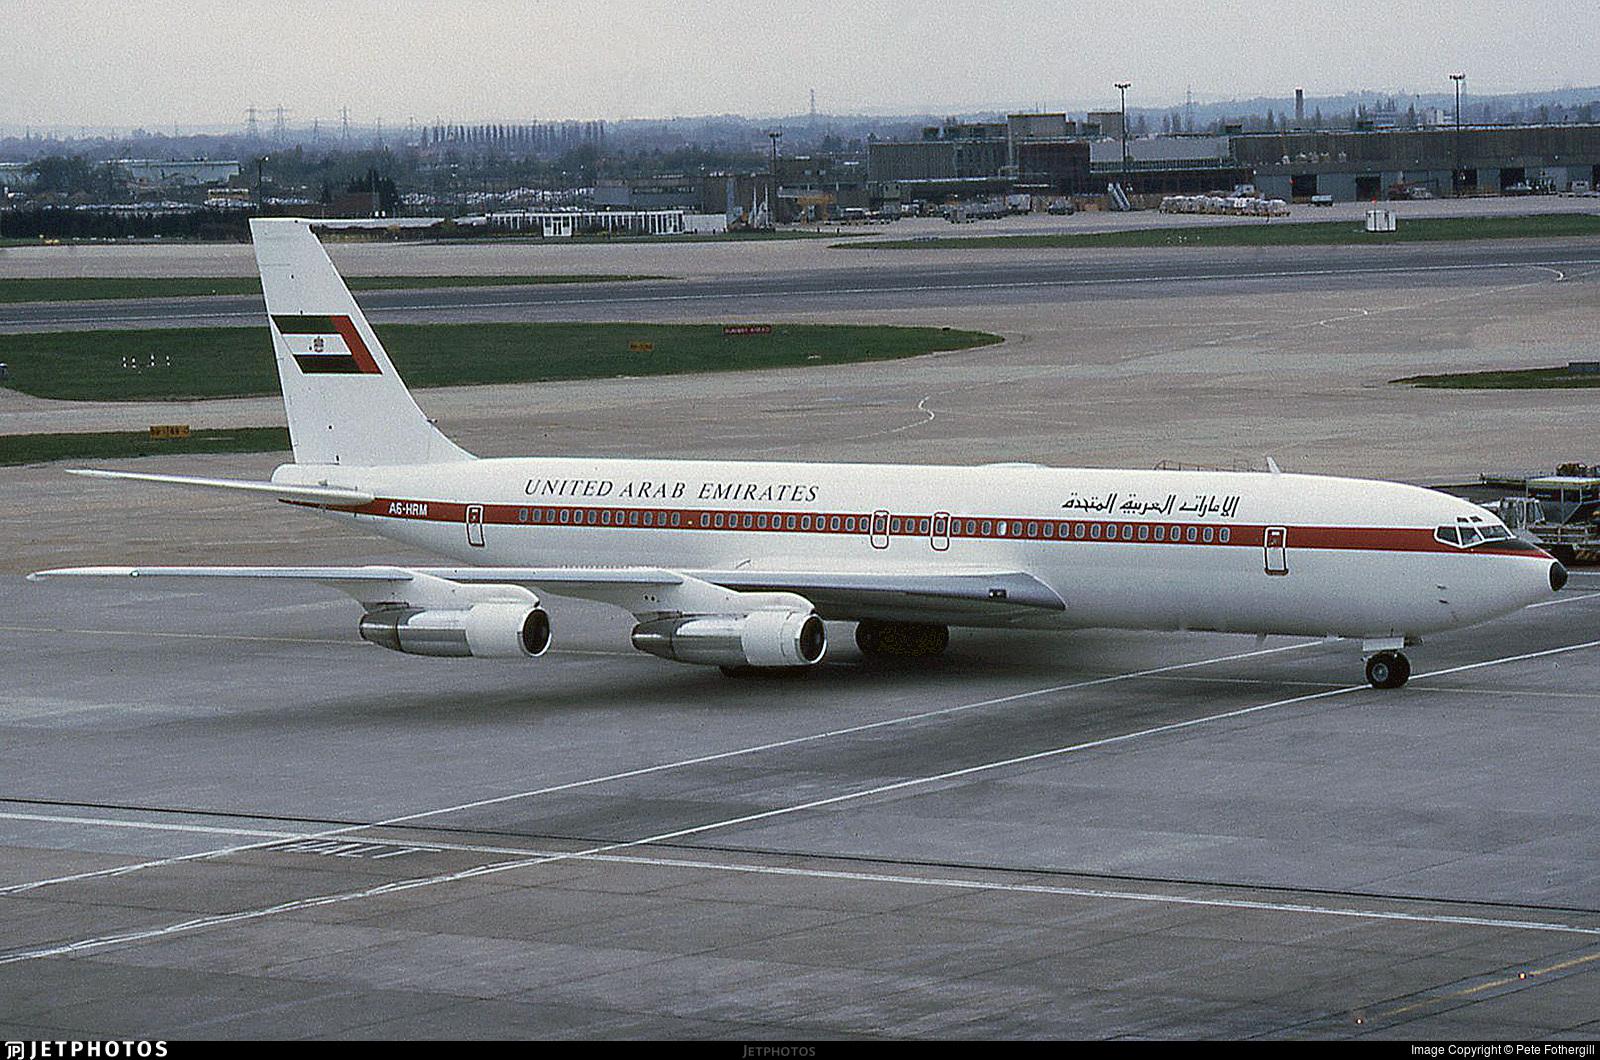 A6-HRM - Boeing 707-3L6C - United Arab Emirates - Dubai Air Wing